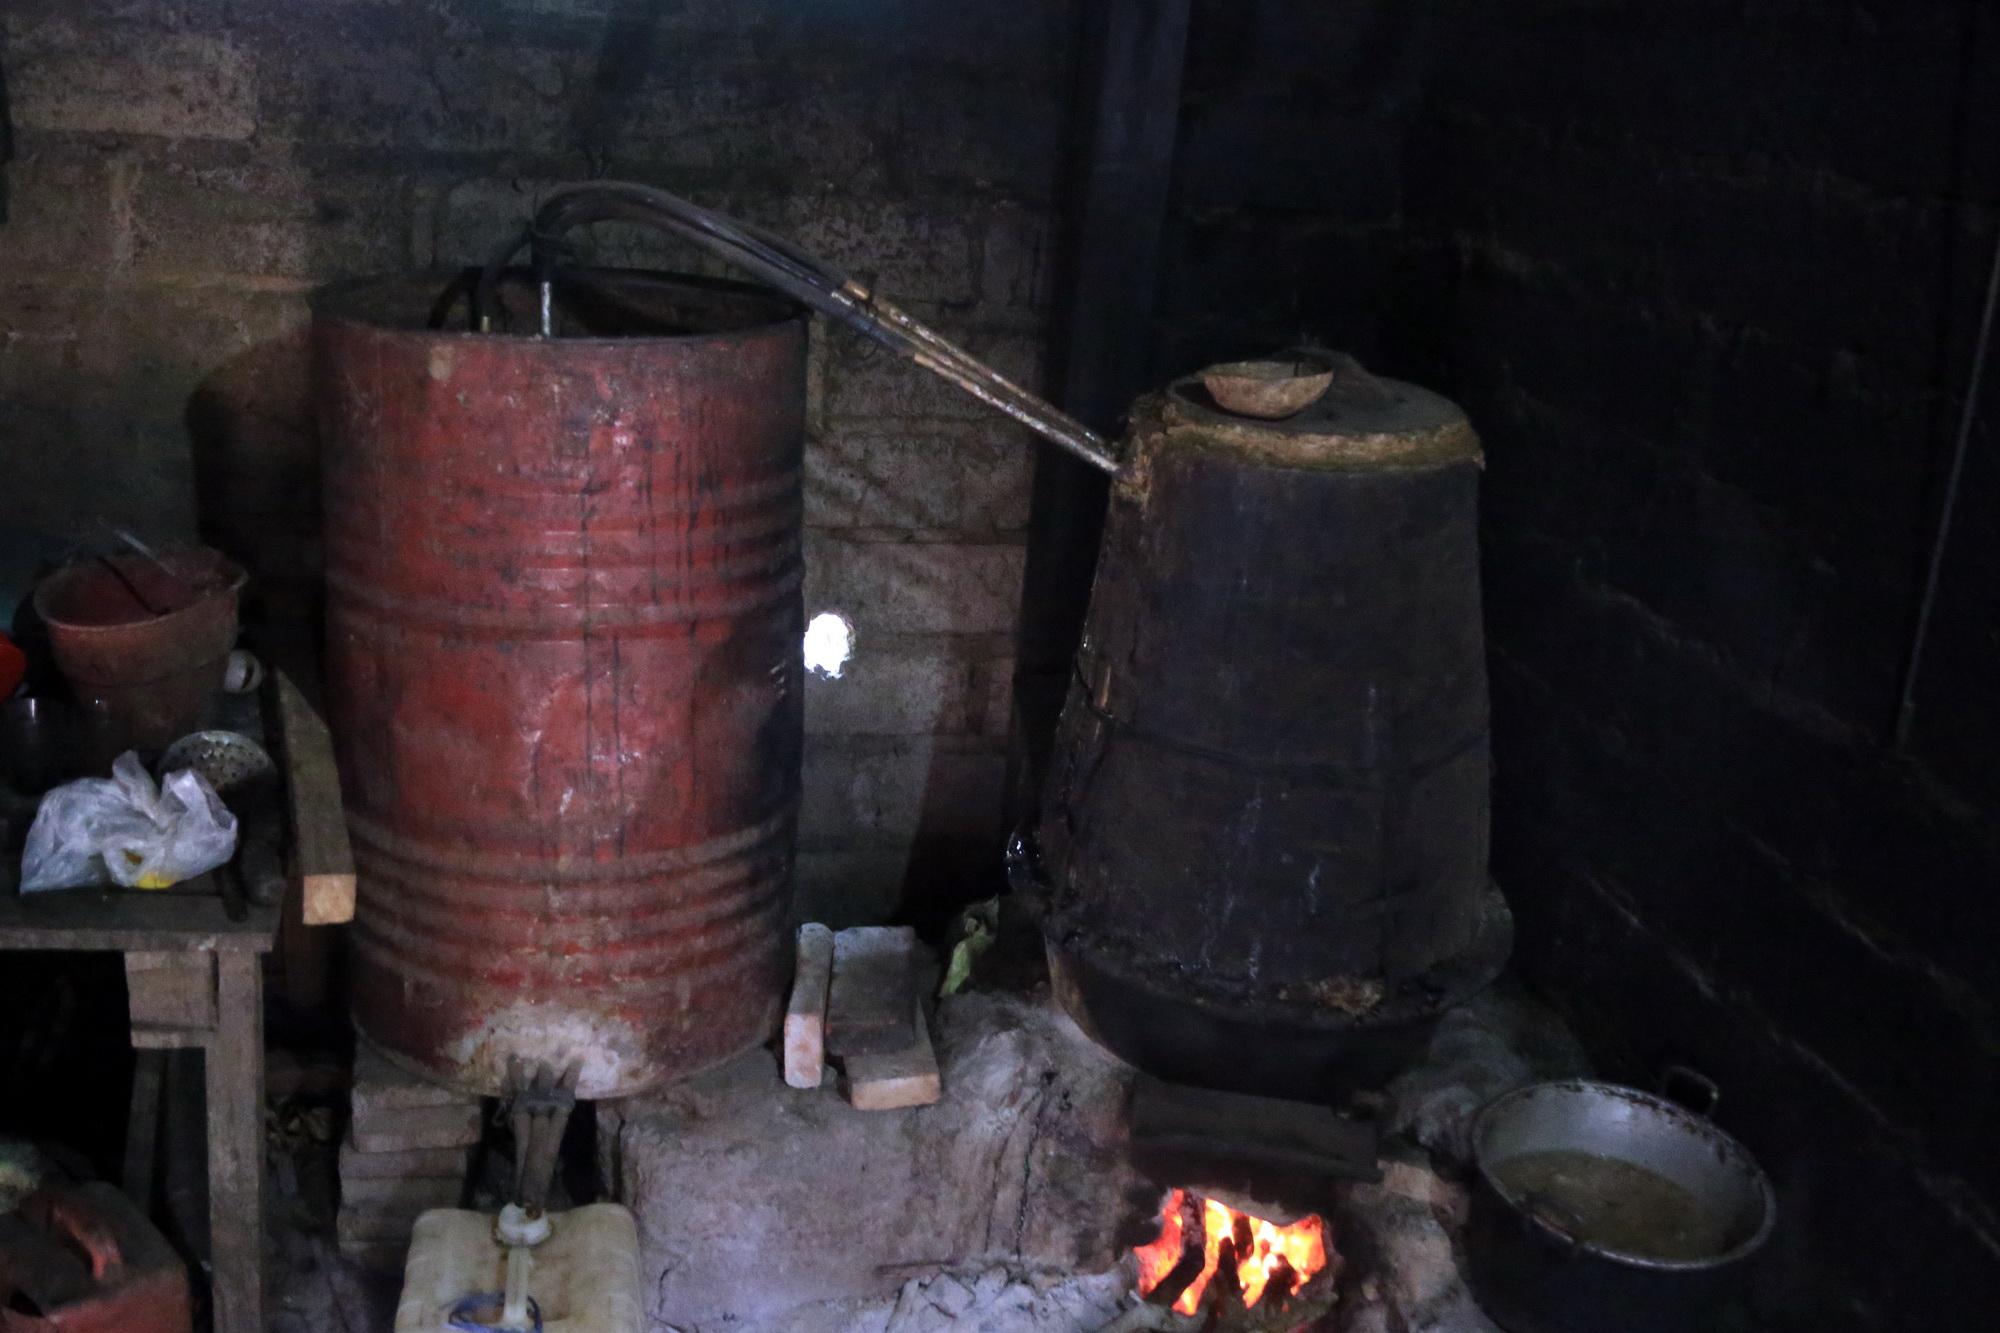 INDUSTRI rumah tangga minuman fermentasi khas Bali di Desa Besan. Foto: ketut bagus Arjana wira